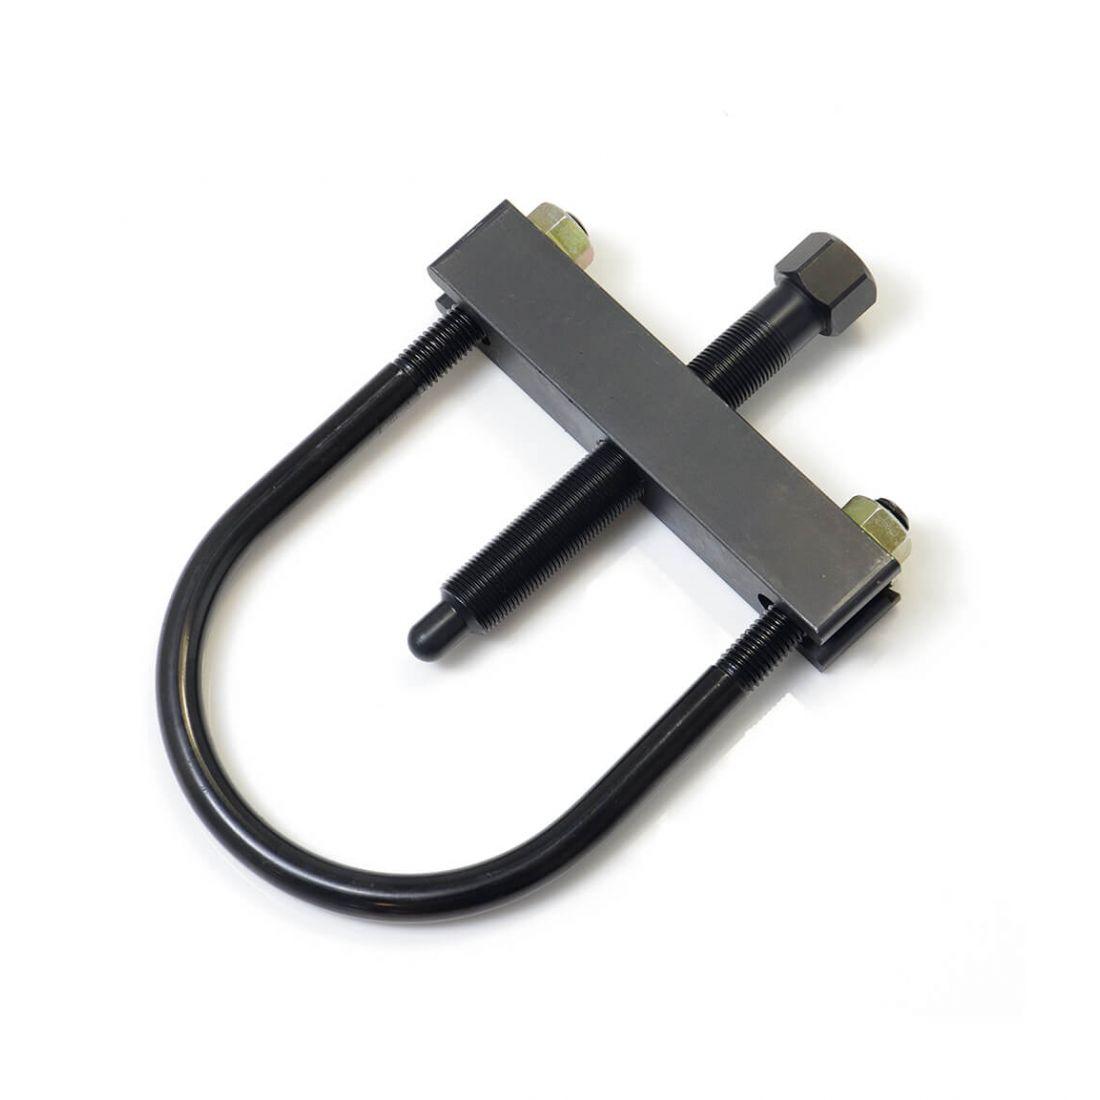 GMC Chevy Dodge Ford Torsion Key Bar Unloading Install Tool